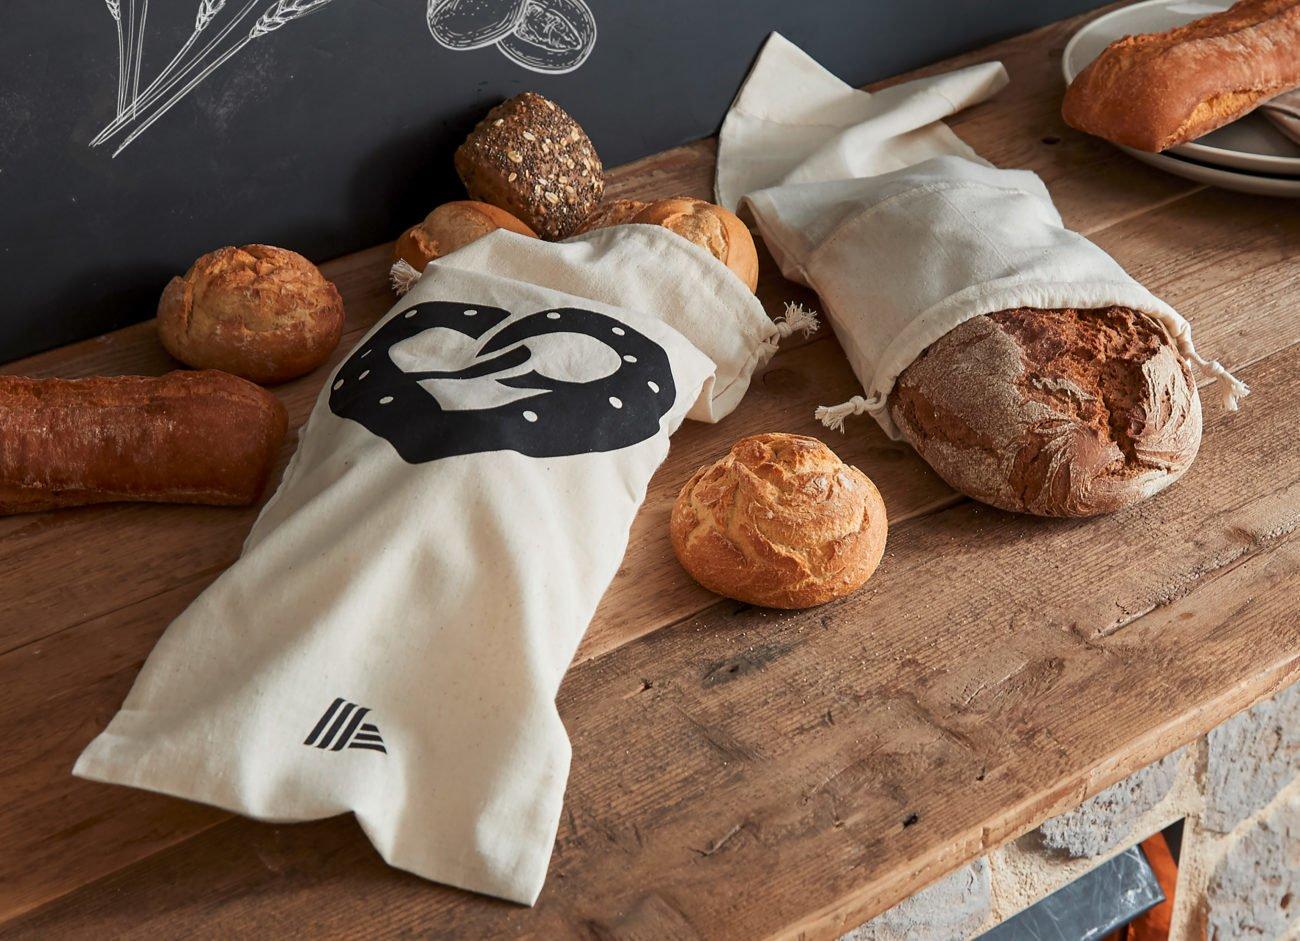 Aldi Neuerung Brotbeutel Brötchenbeutel